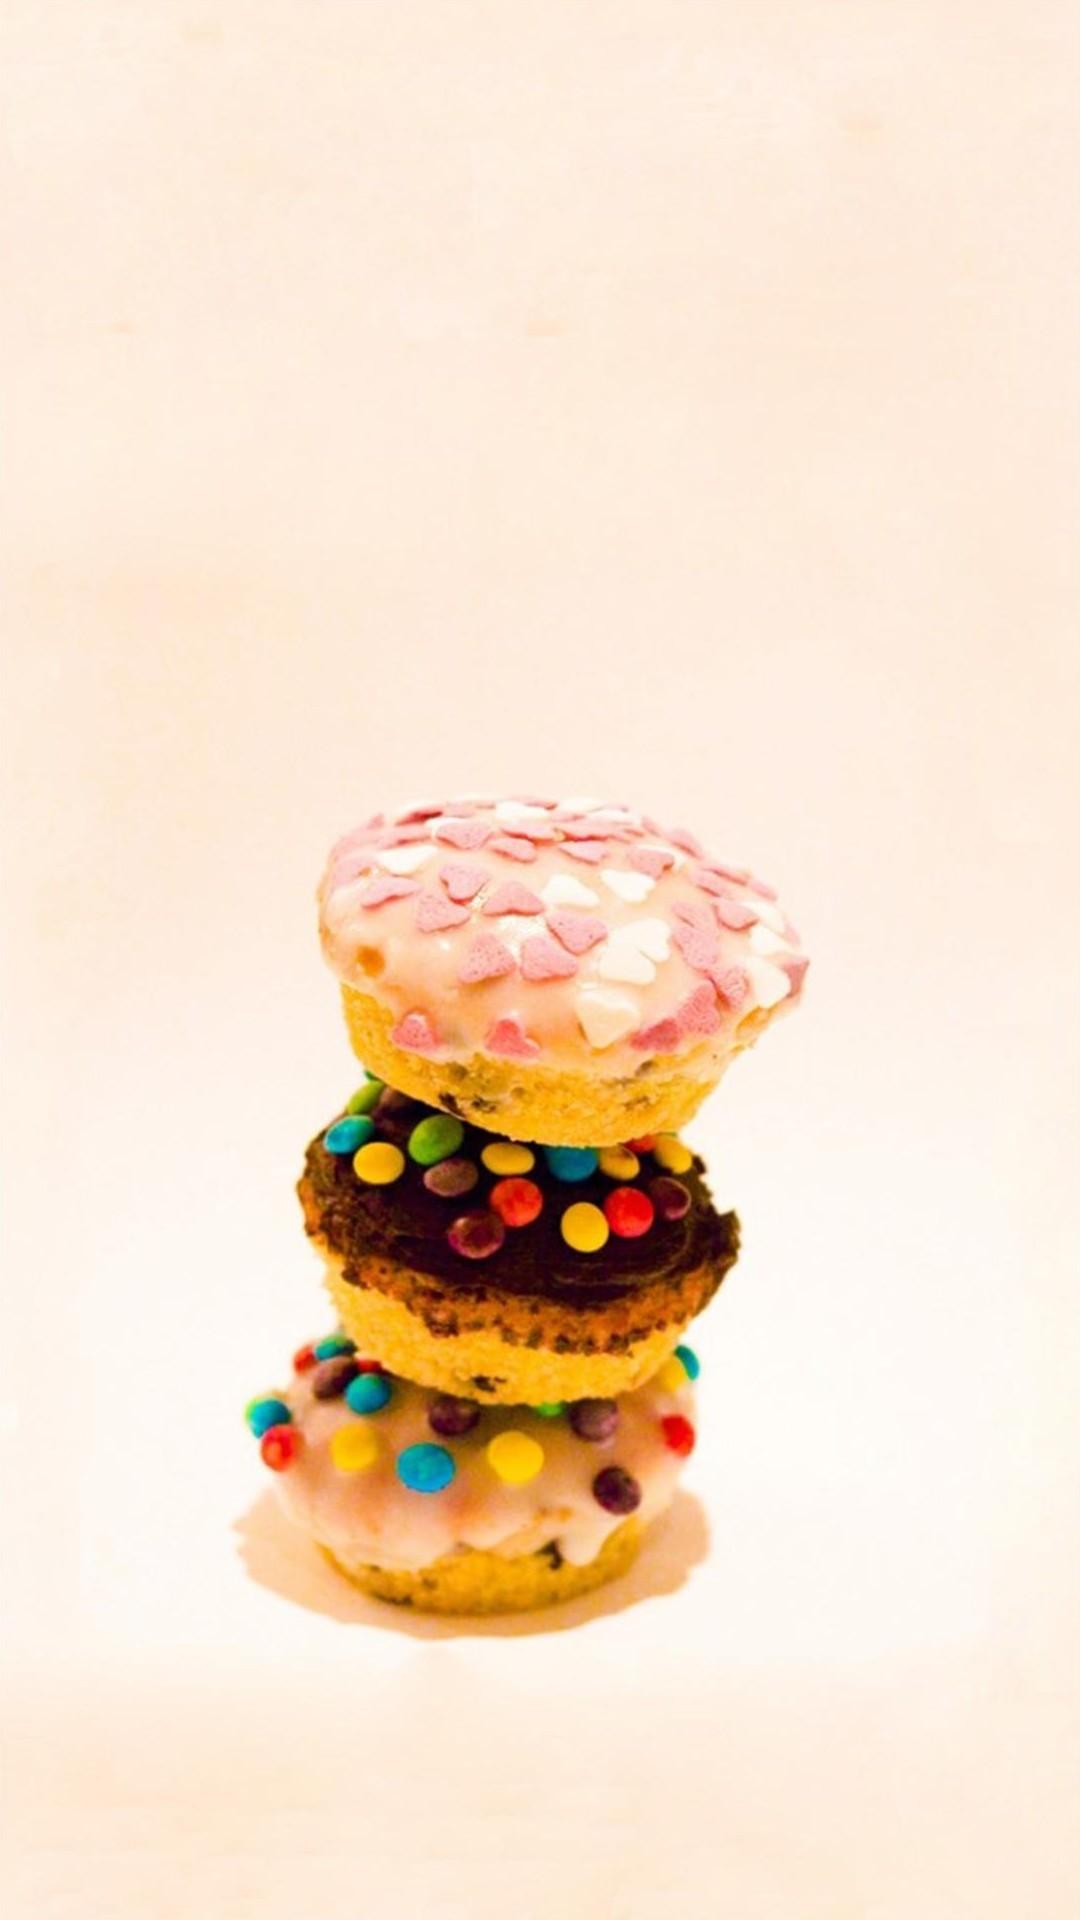 Delicious Cute Colorful Cupcake #iPhone #6 #plus #wallpaper